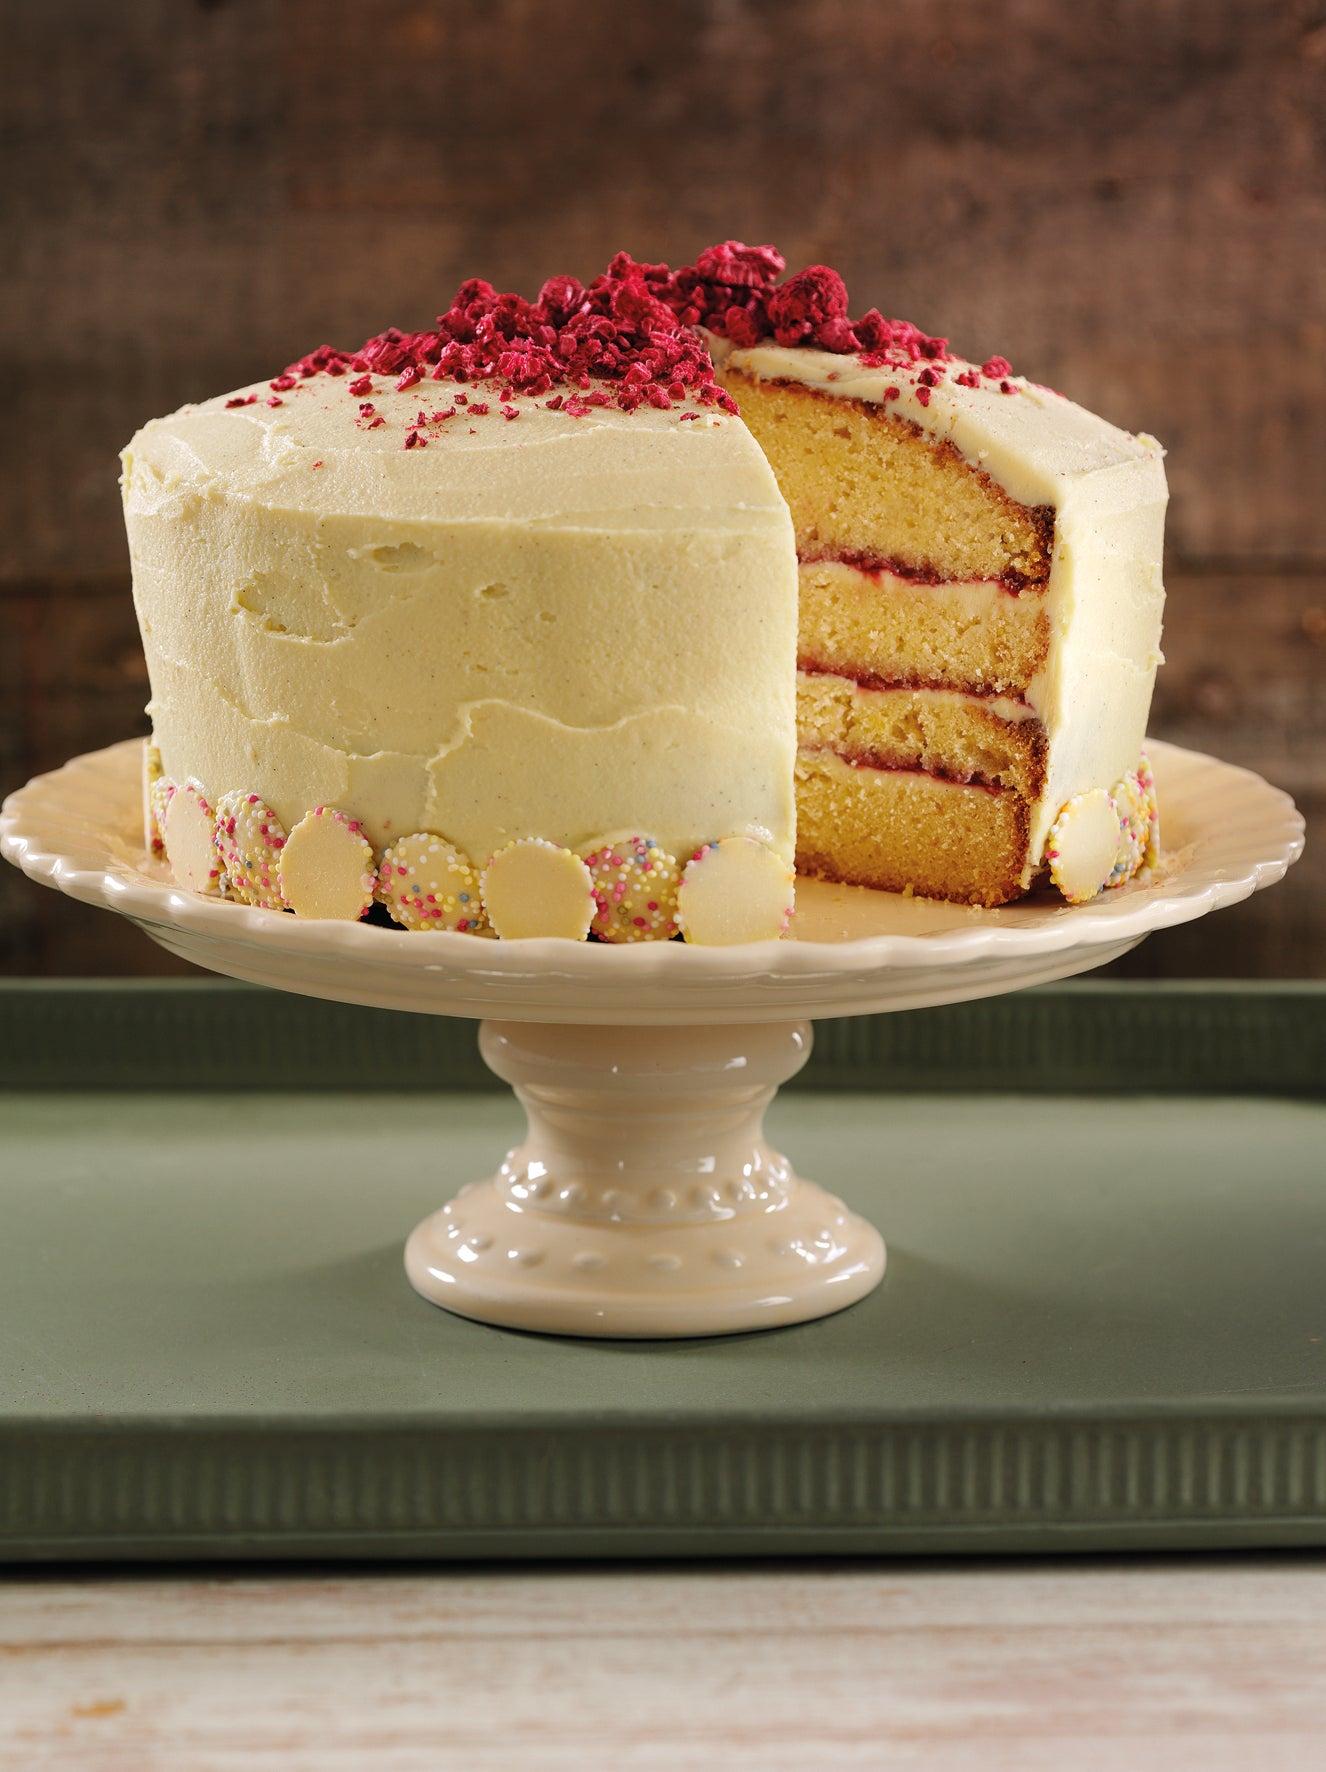 Nielsen-Massey-Vanilla,-Raspberry-White-Chocolate-Victoria-Sponge.jpg